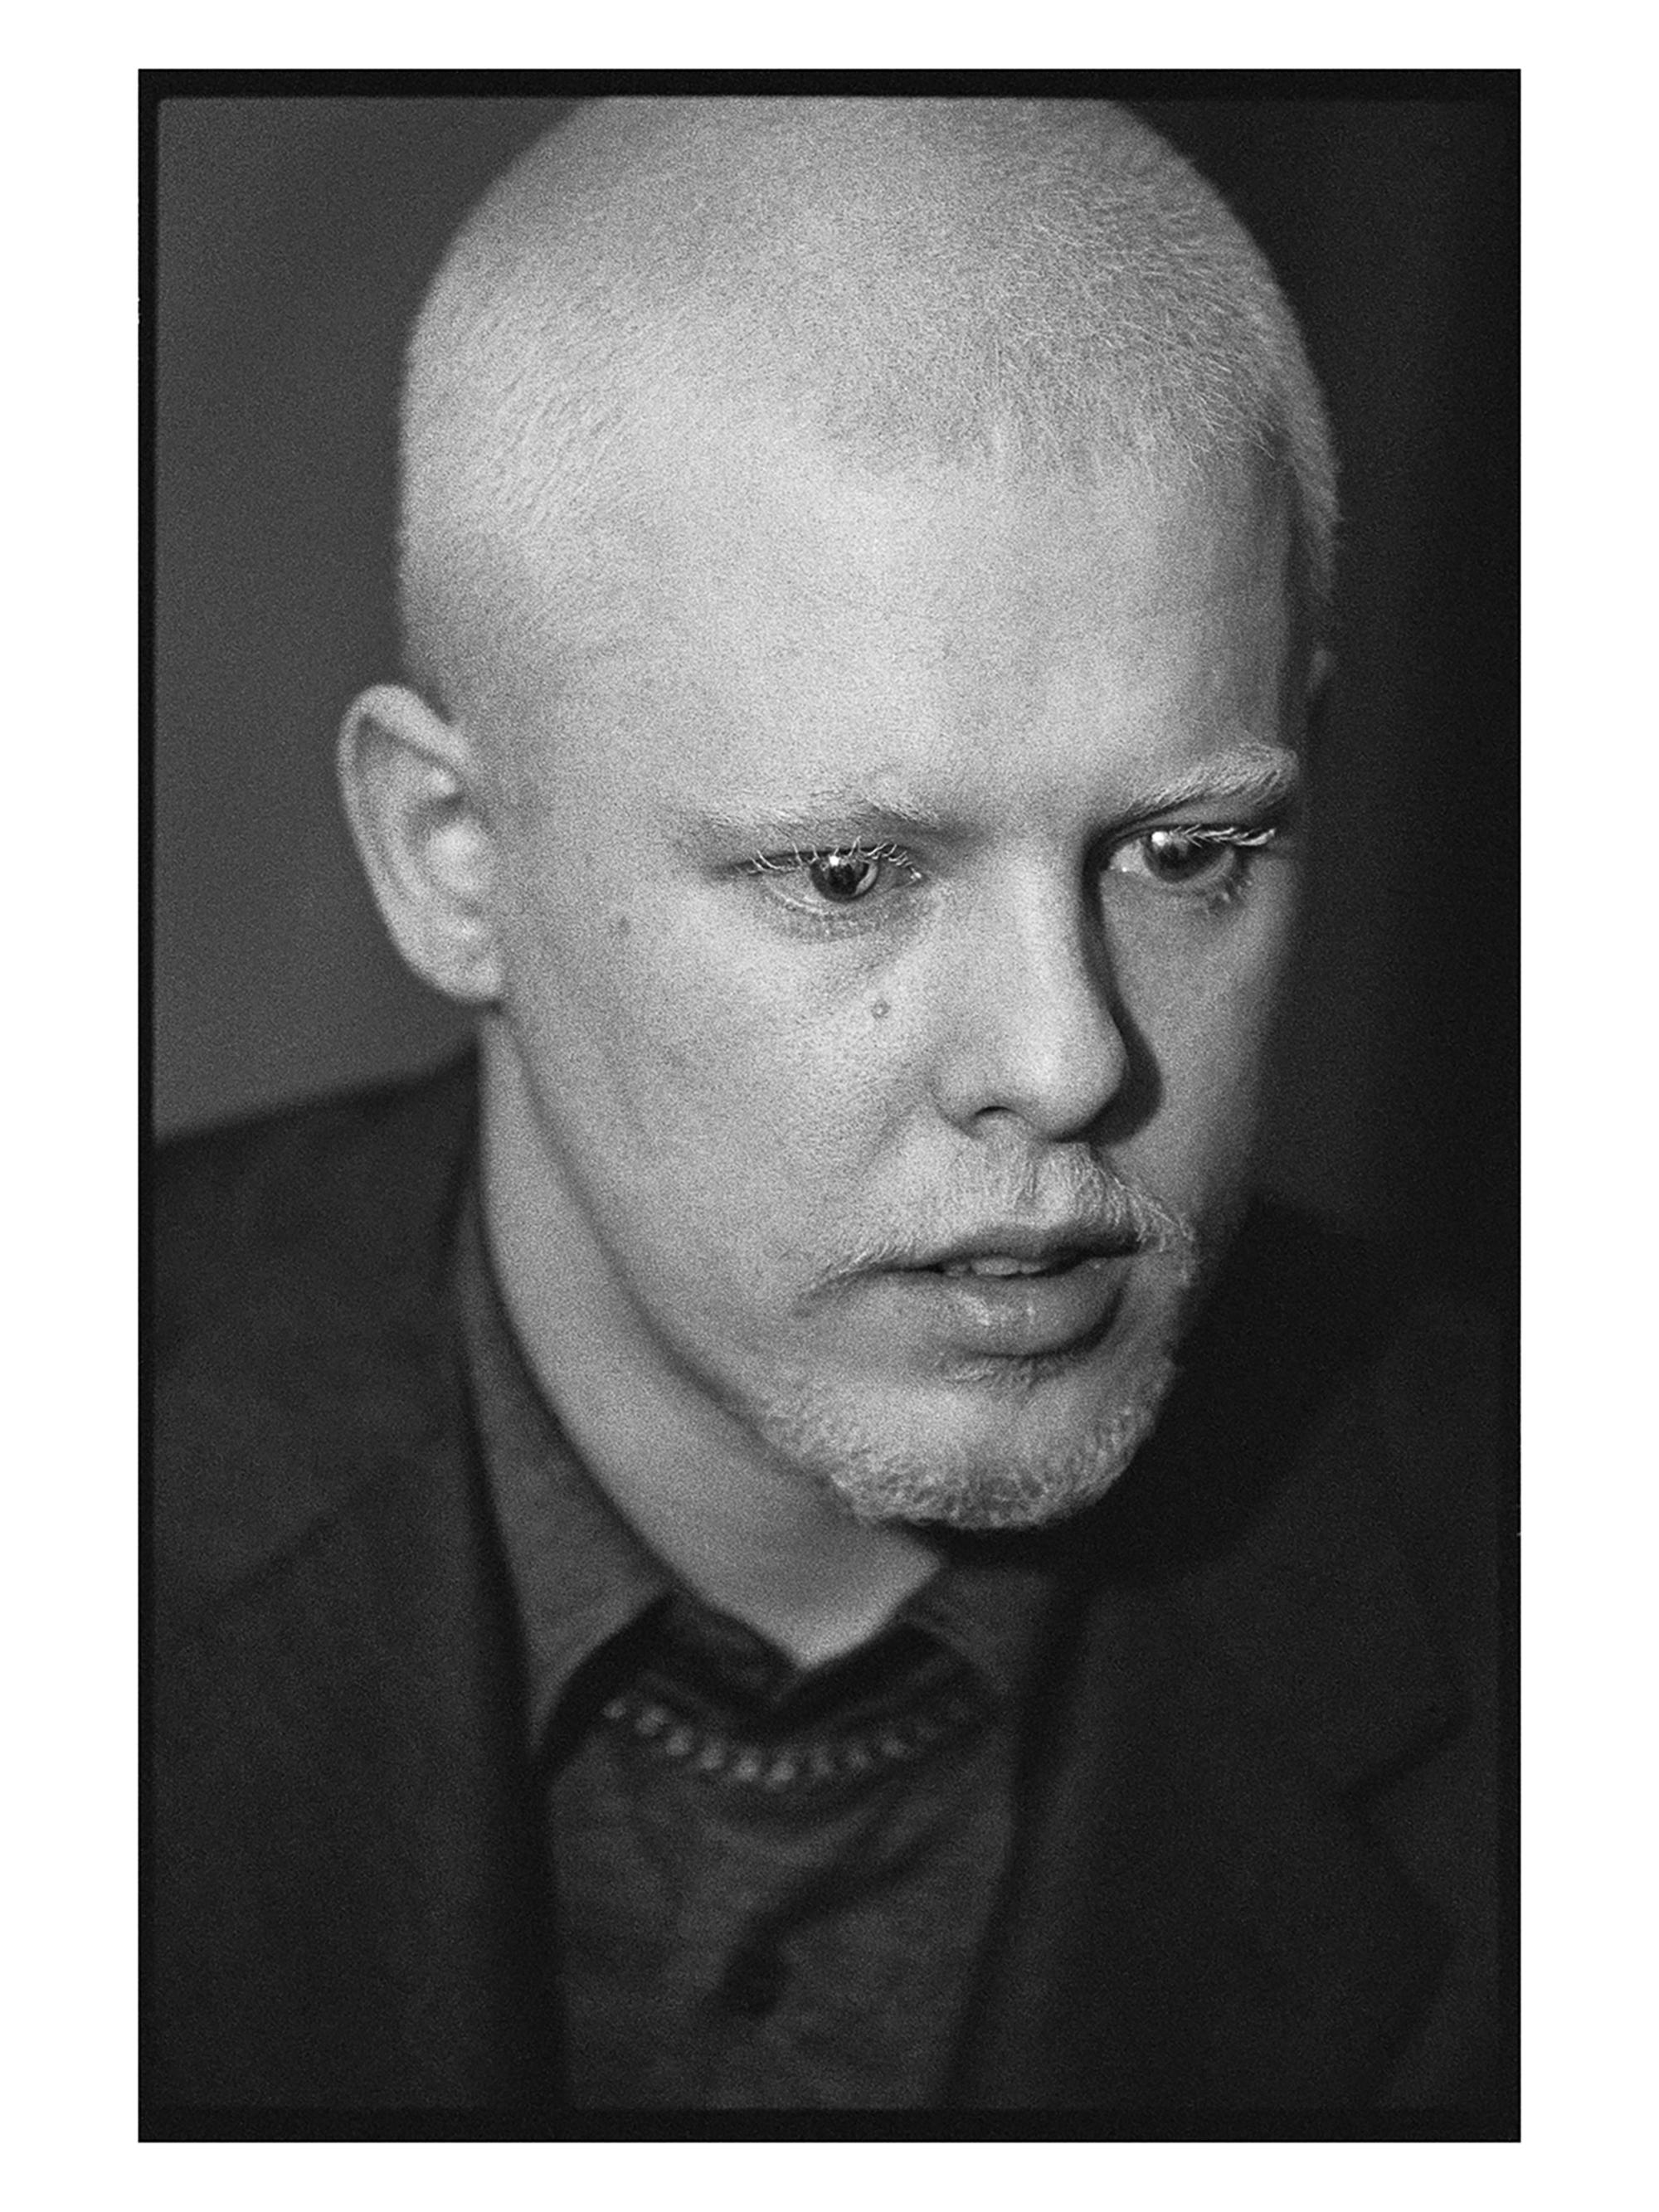 Alexander McQueen portrait by Ann Ray